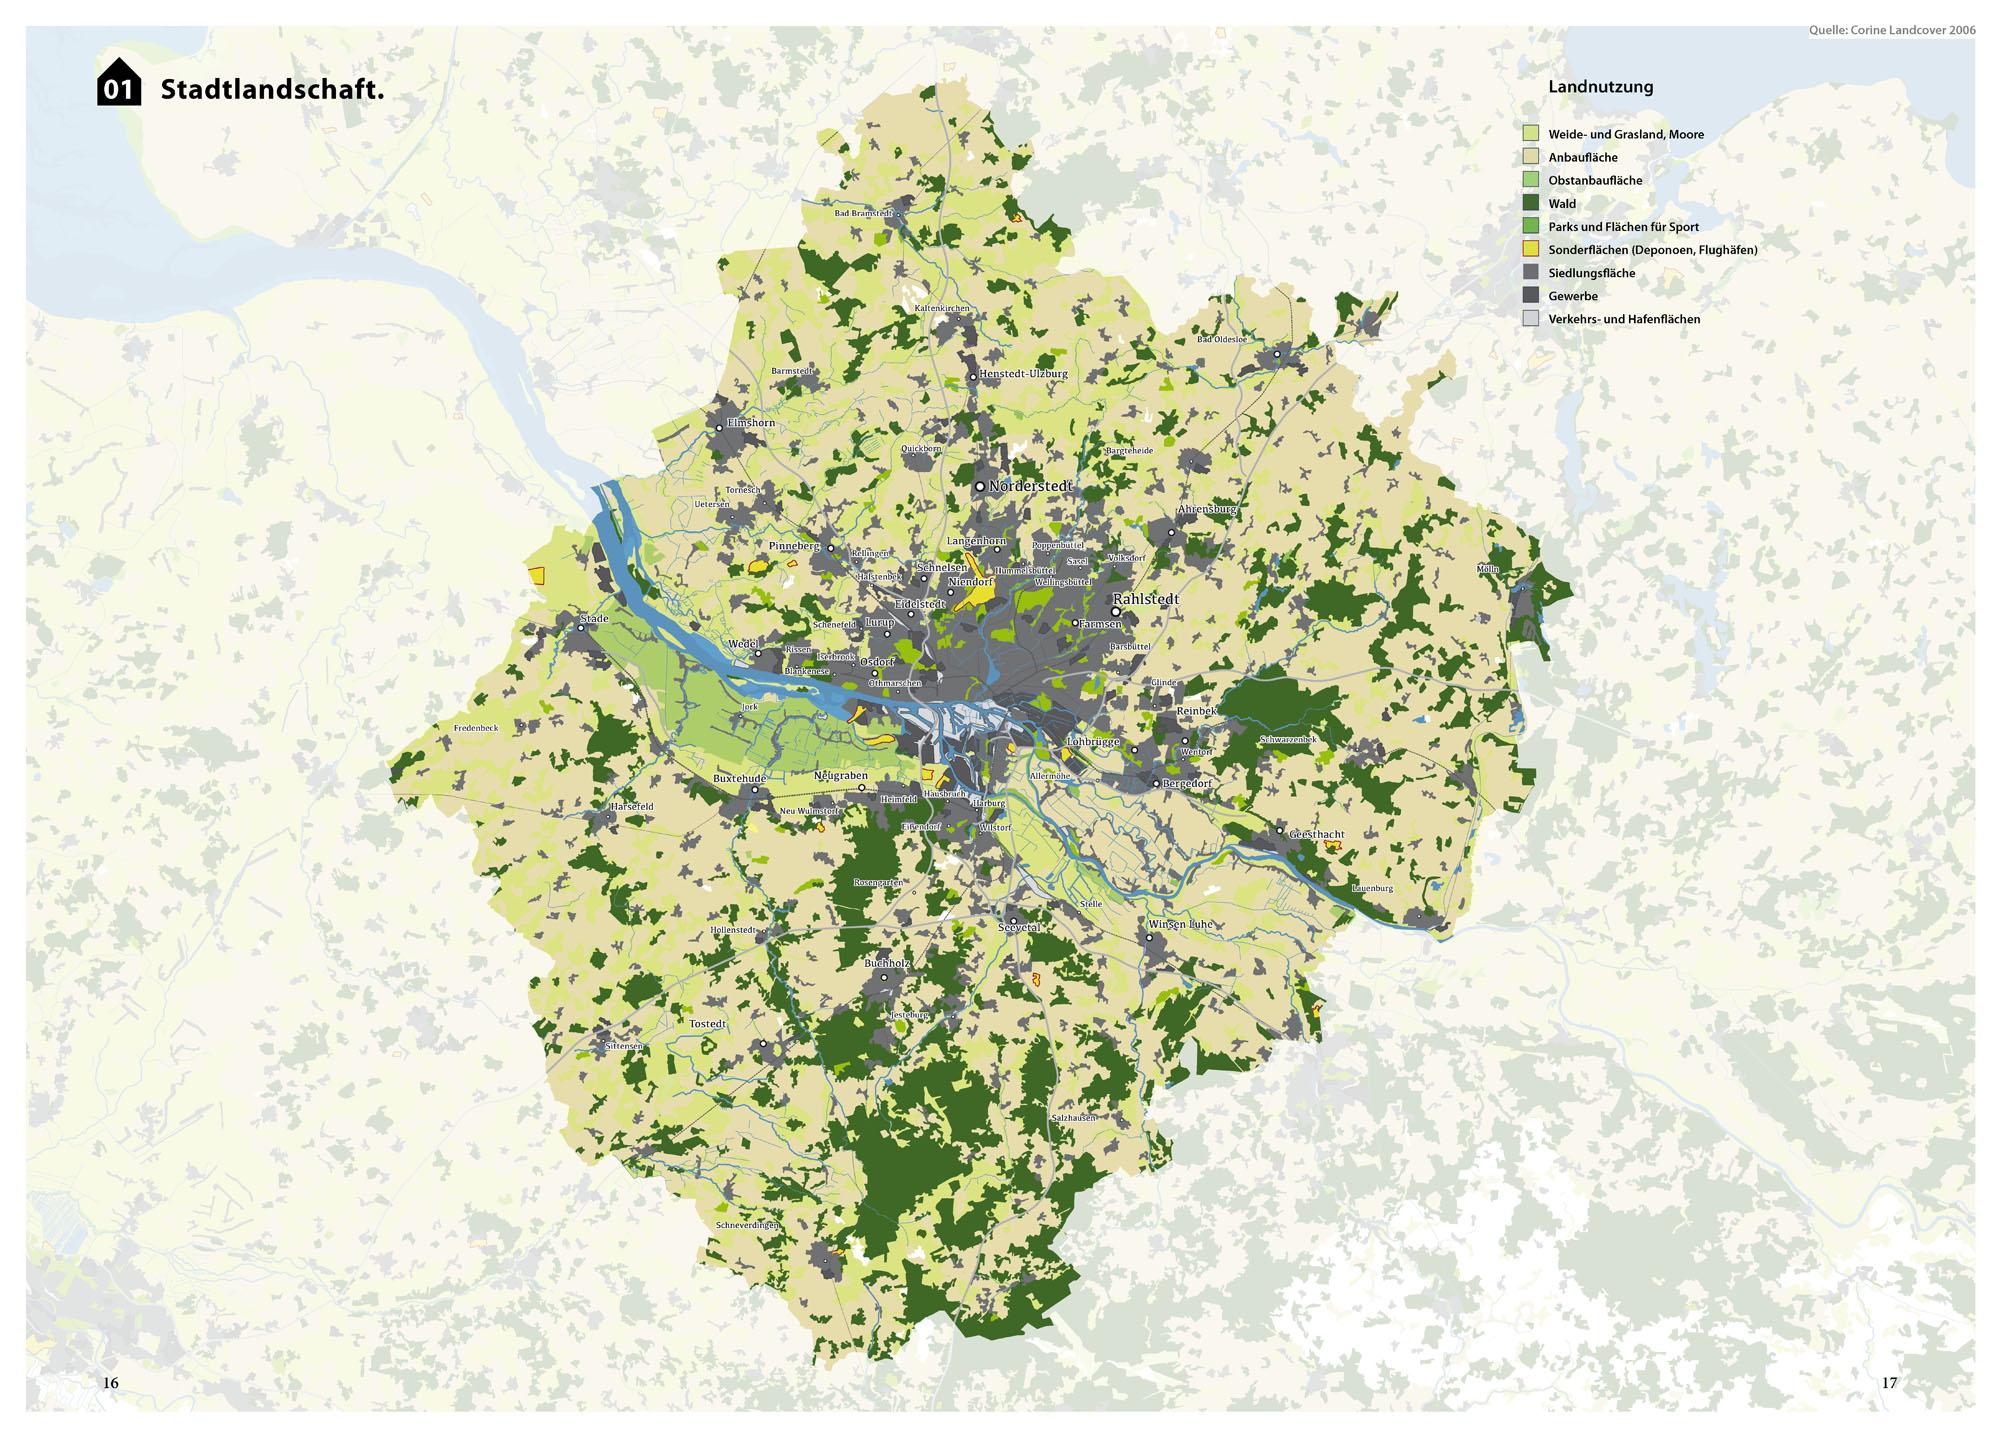 Suburbia Atlas Hamburg Stadtlandschaft Landnutzung Karte